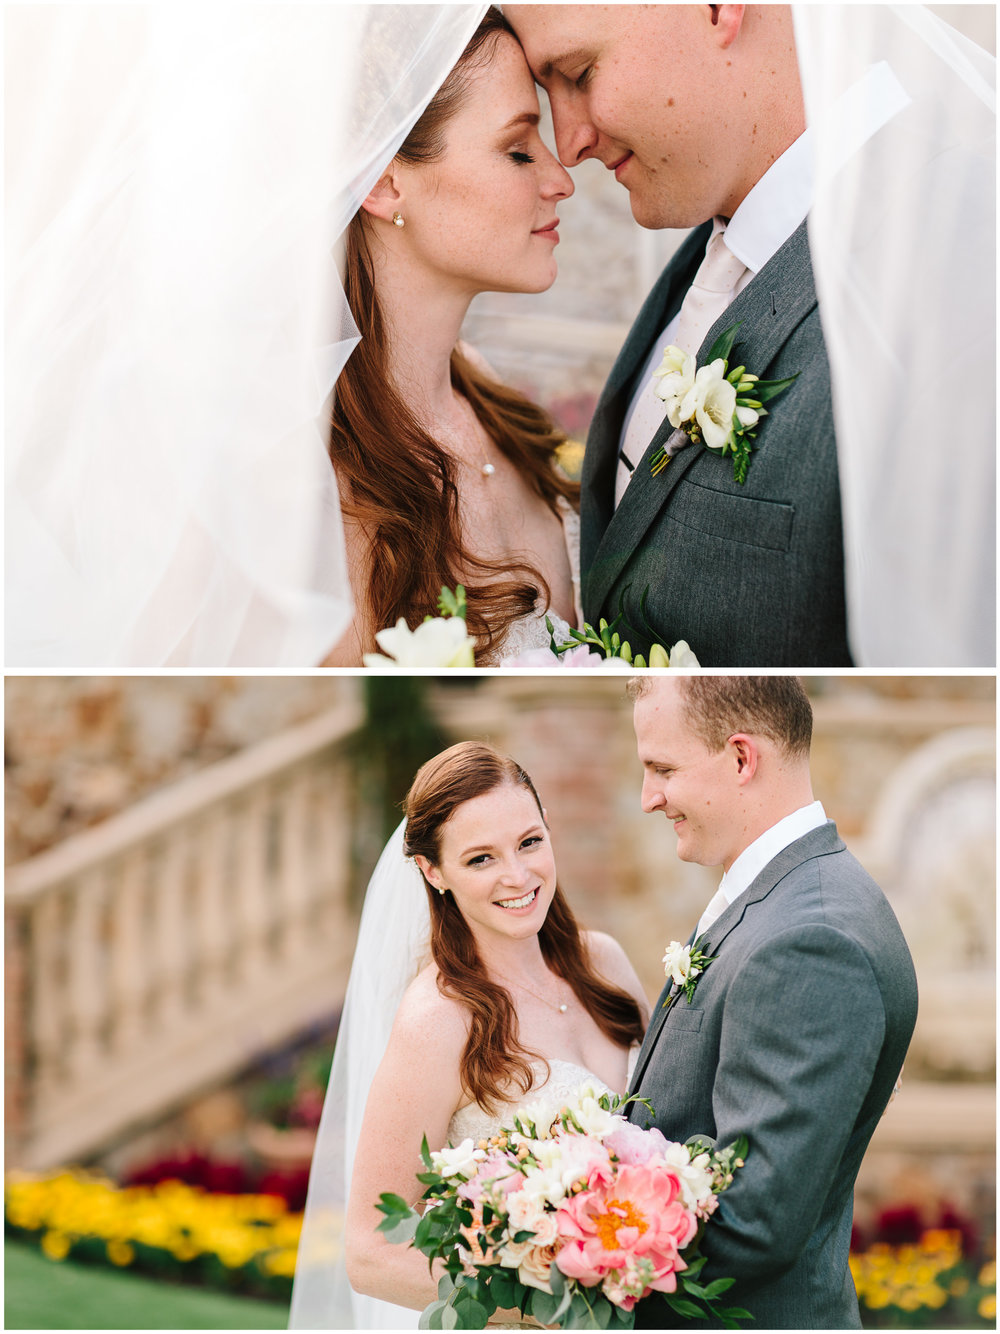 bella_collina_wedding_58.jpg